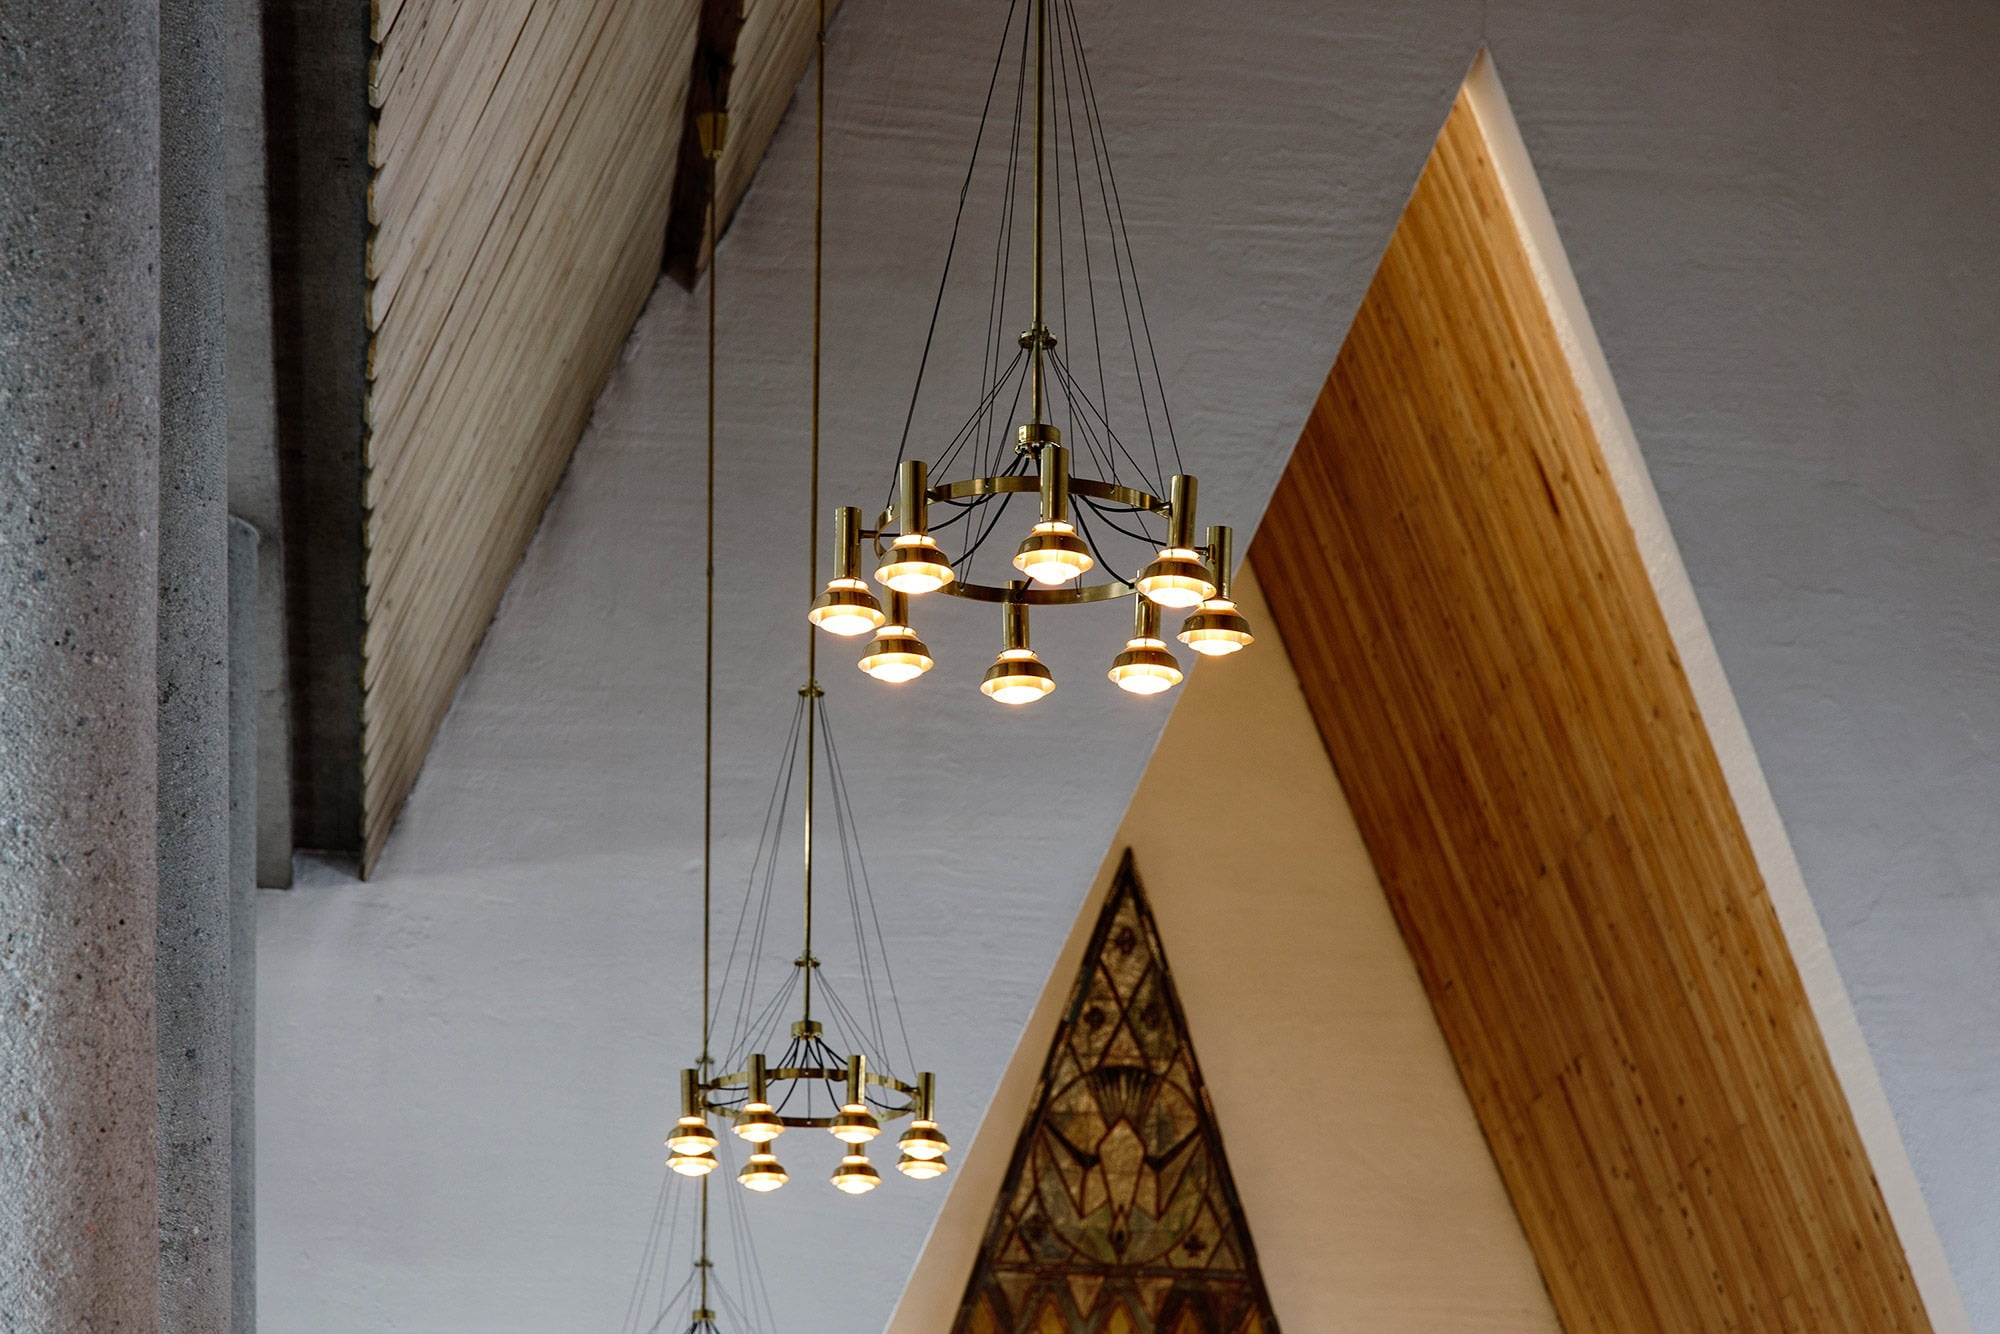 Interior design, Material property, Light, Wood, Amber, Lamp, Line